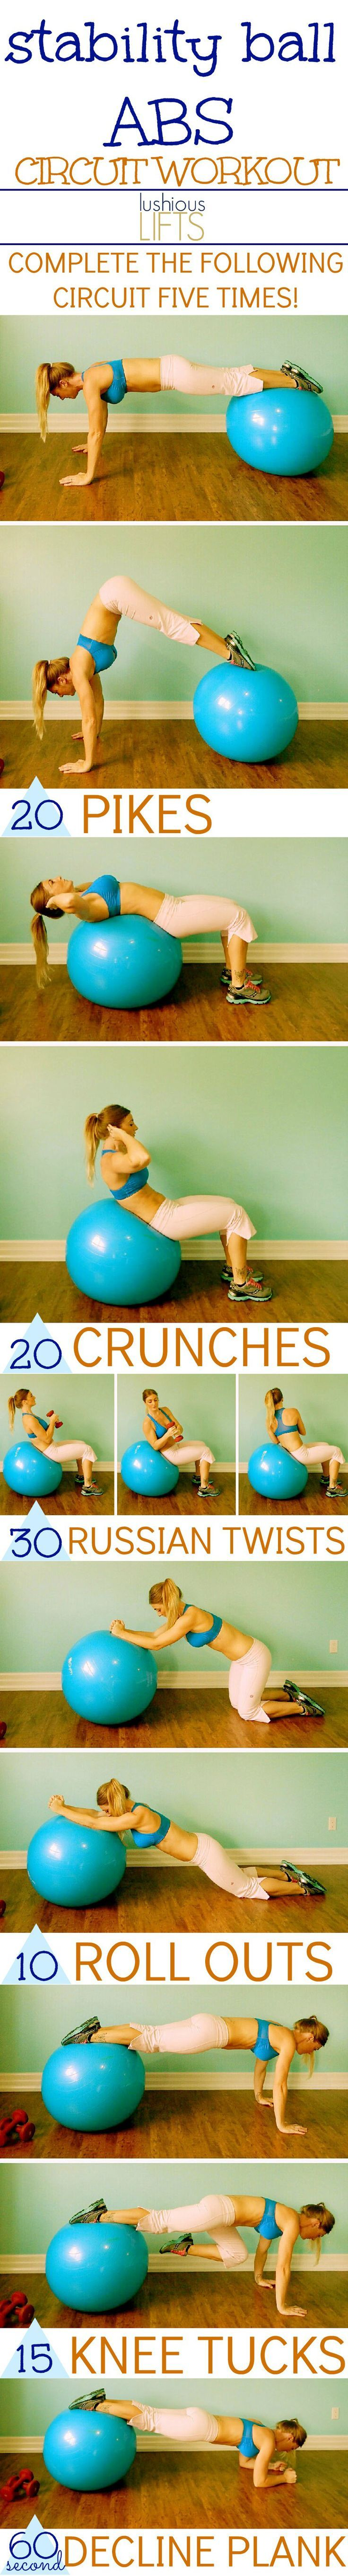 Stability Ball Abdominal Circuit Workout http://lushiouslifts.com/stability-ball-abs-circuit/ #Fitness #Workout Pin/Via -